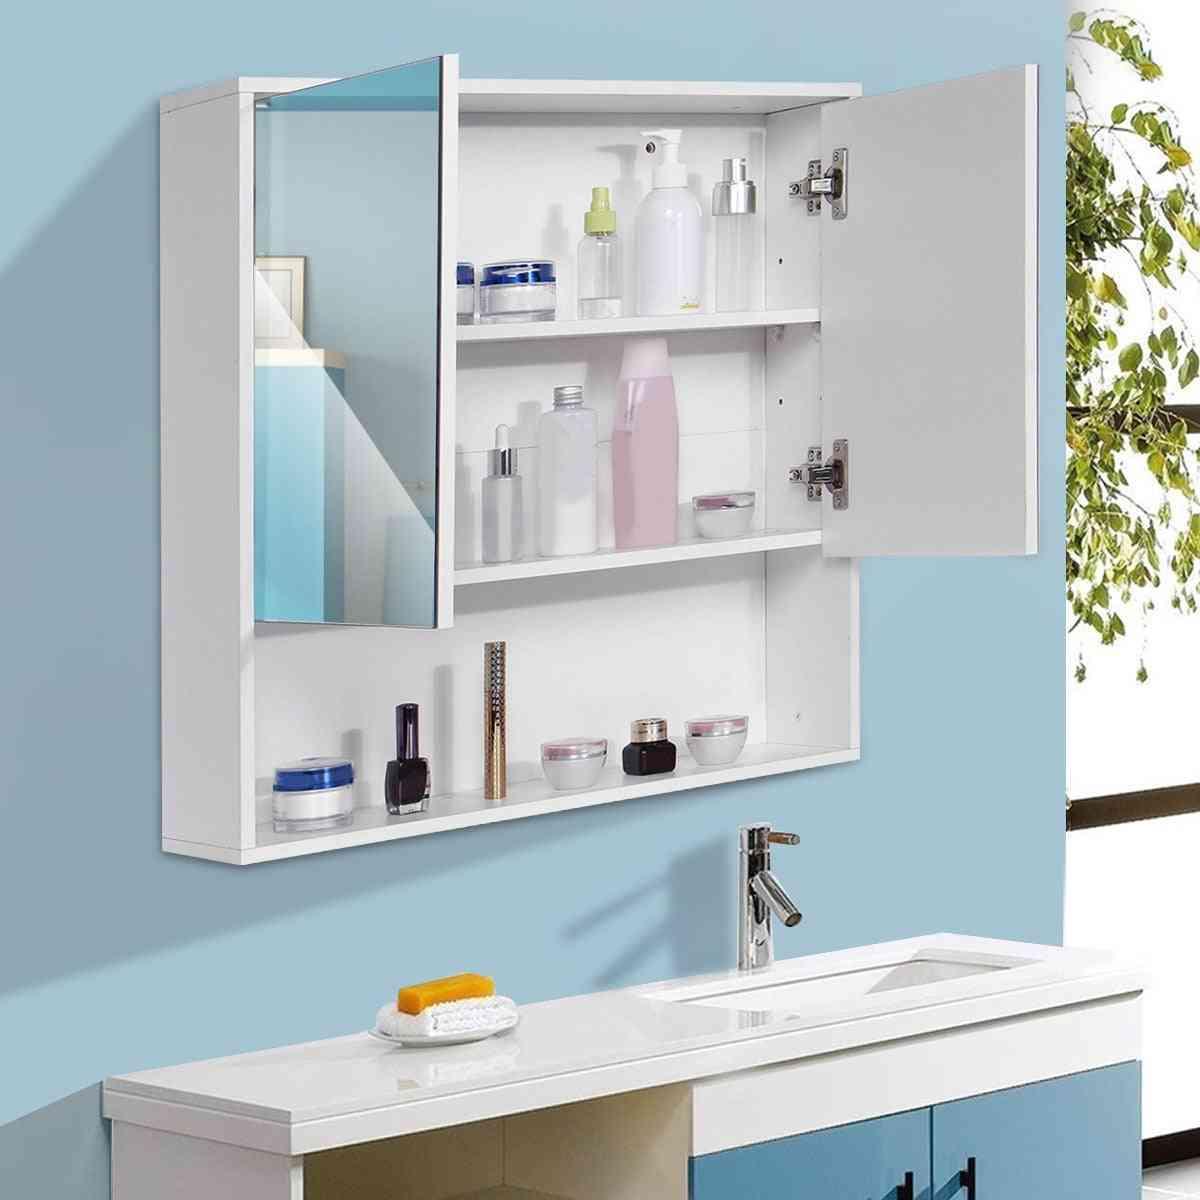 Bathroom Mirror Cabinet, Wall Mounted Furniture Cupboard Shelf Storage Cabinets